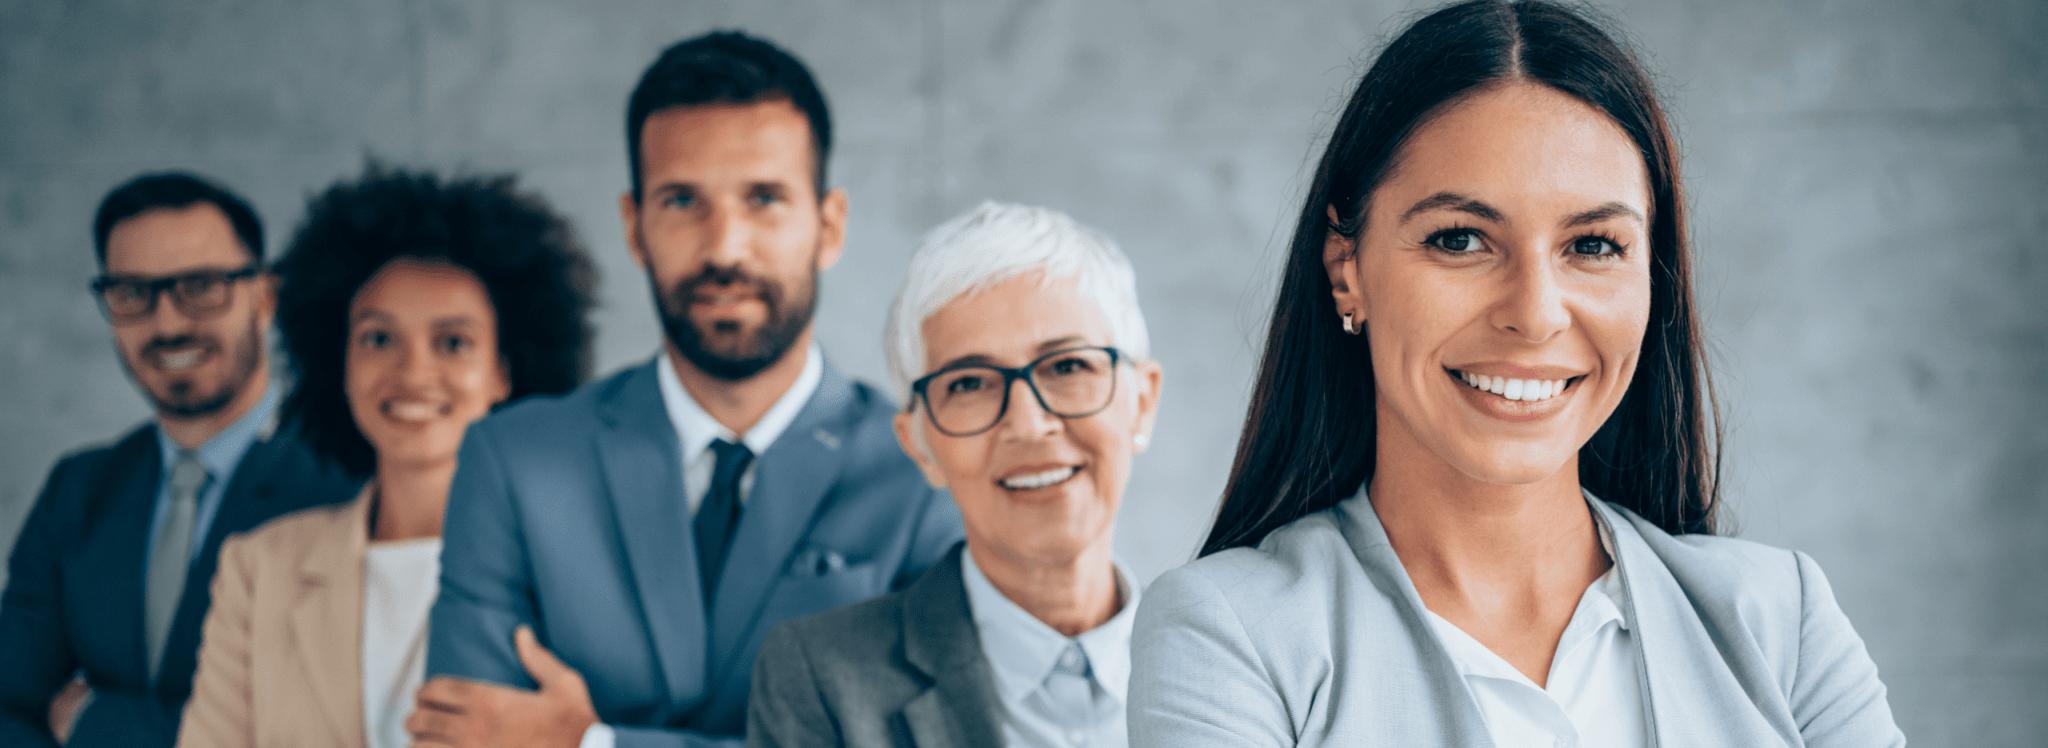 Wollny Personal GmbH - Karriere bei Wollny Personal GmbH